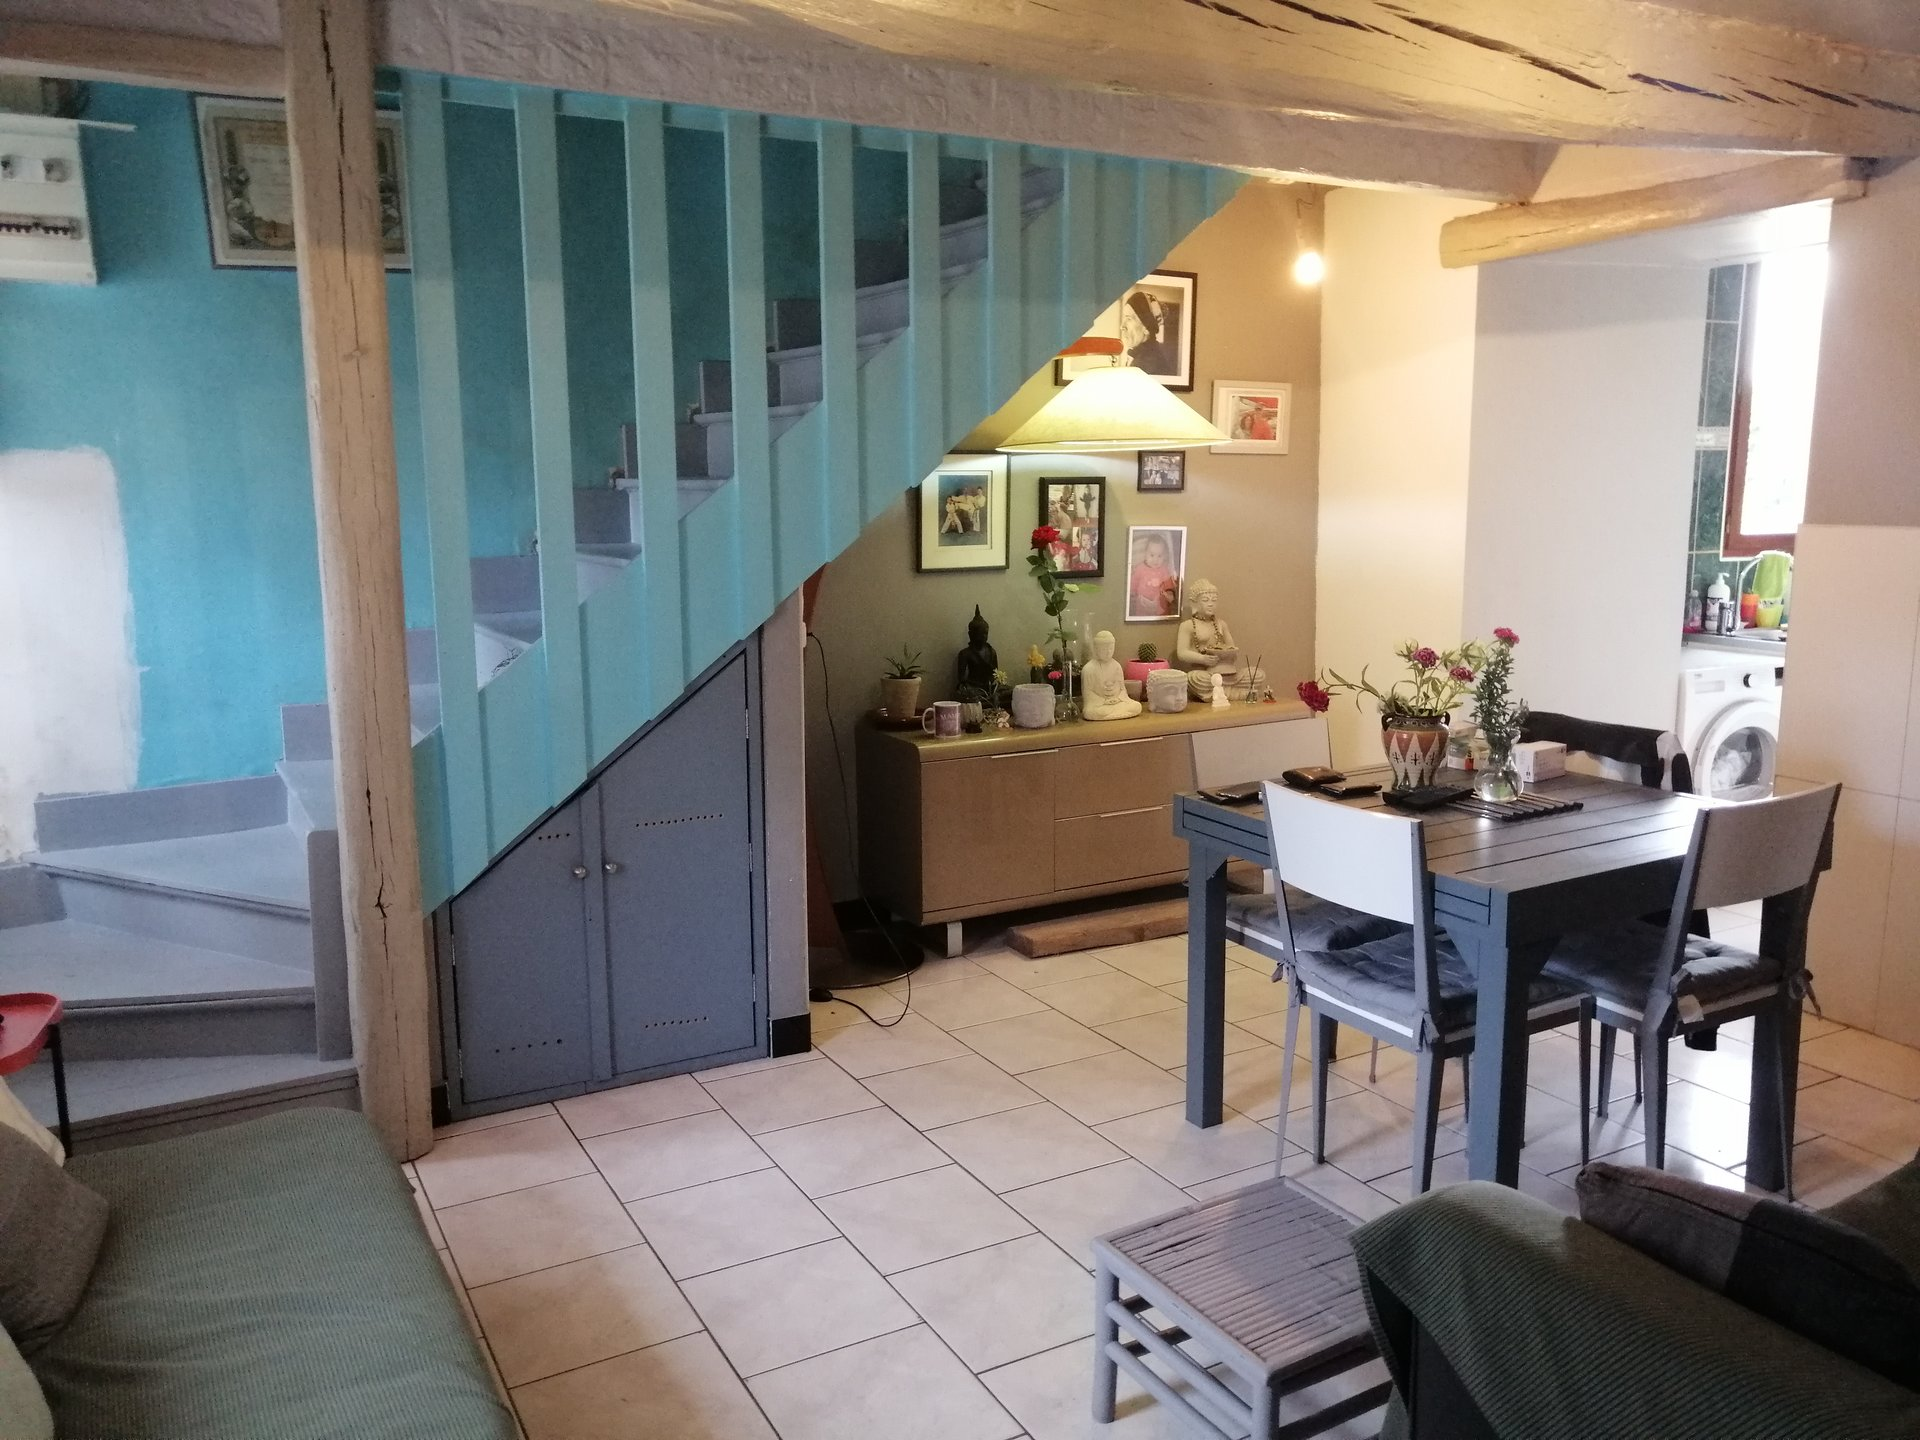 Maison De Caractère - Saint-Maximin - 229 000 € FAI